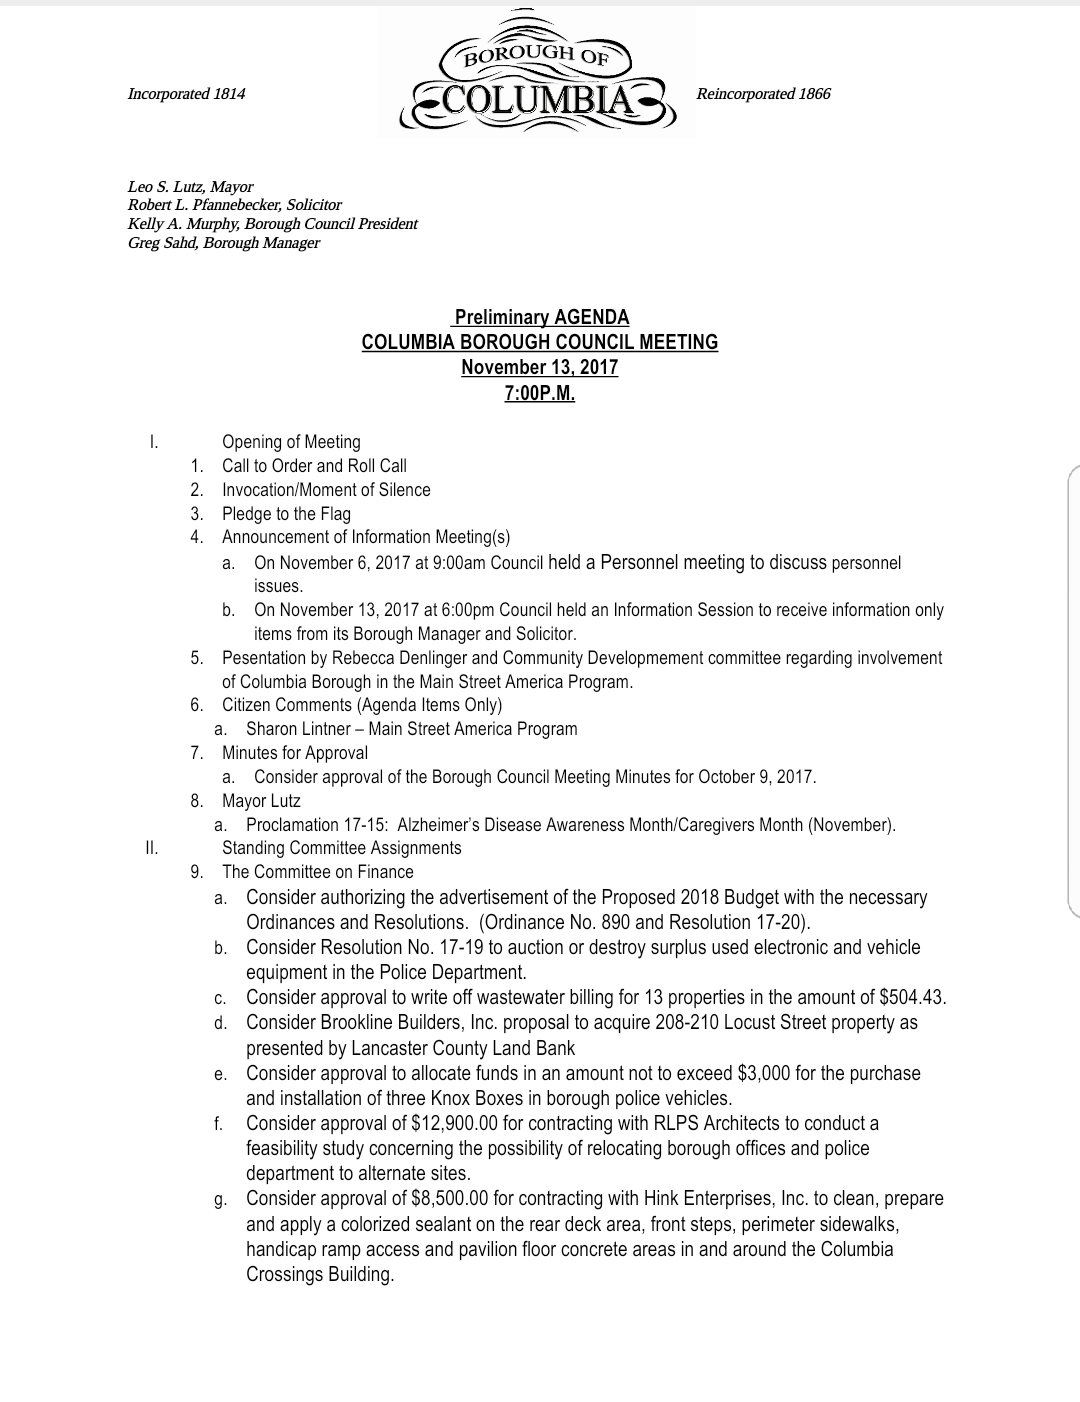 COLUMBIA SPY Draft Agenda Borough Council Meeting November 13 2017 – Draft Meeting Agenda